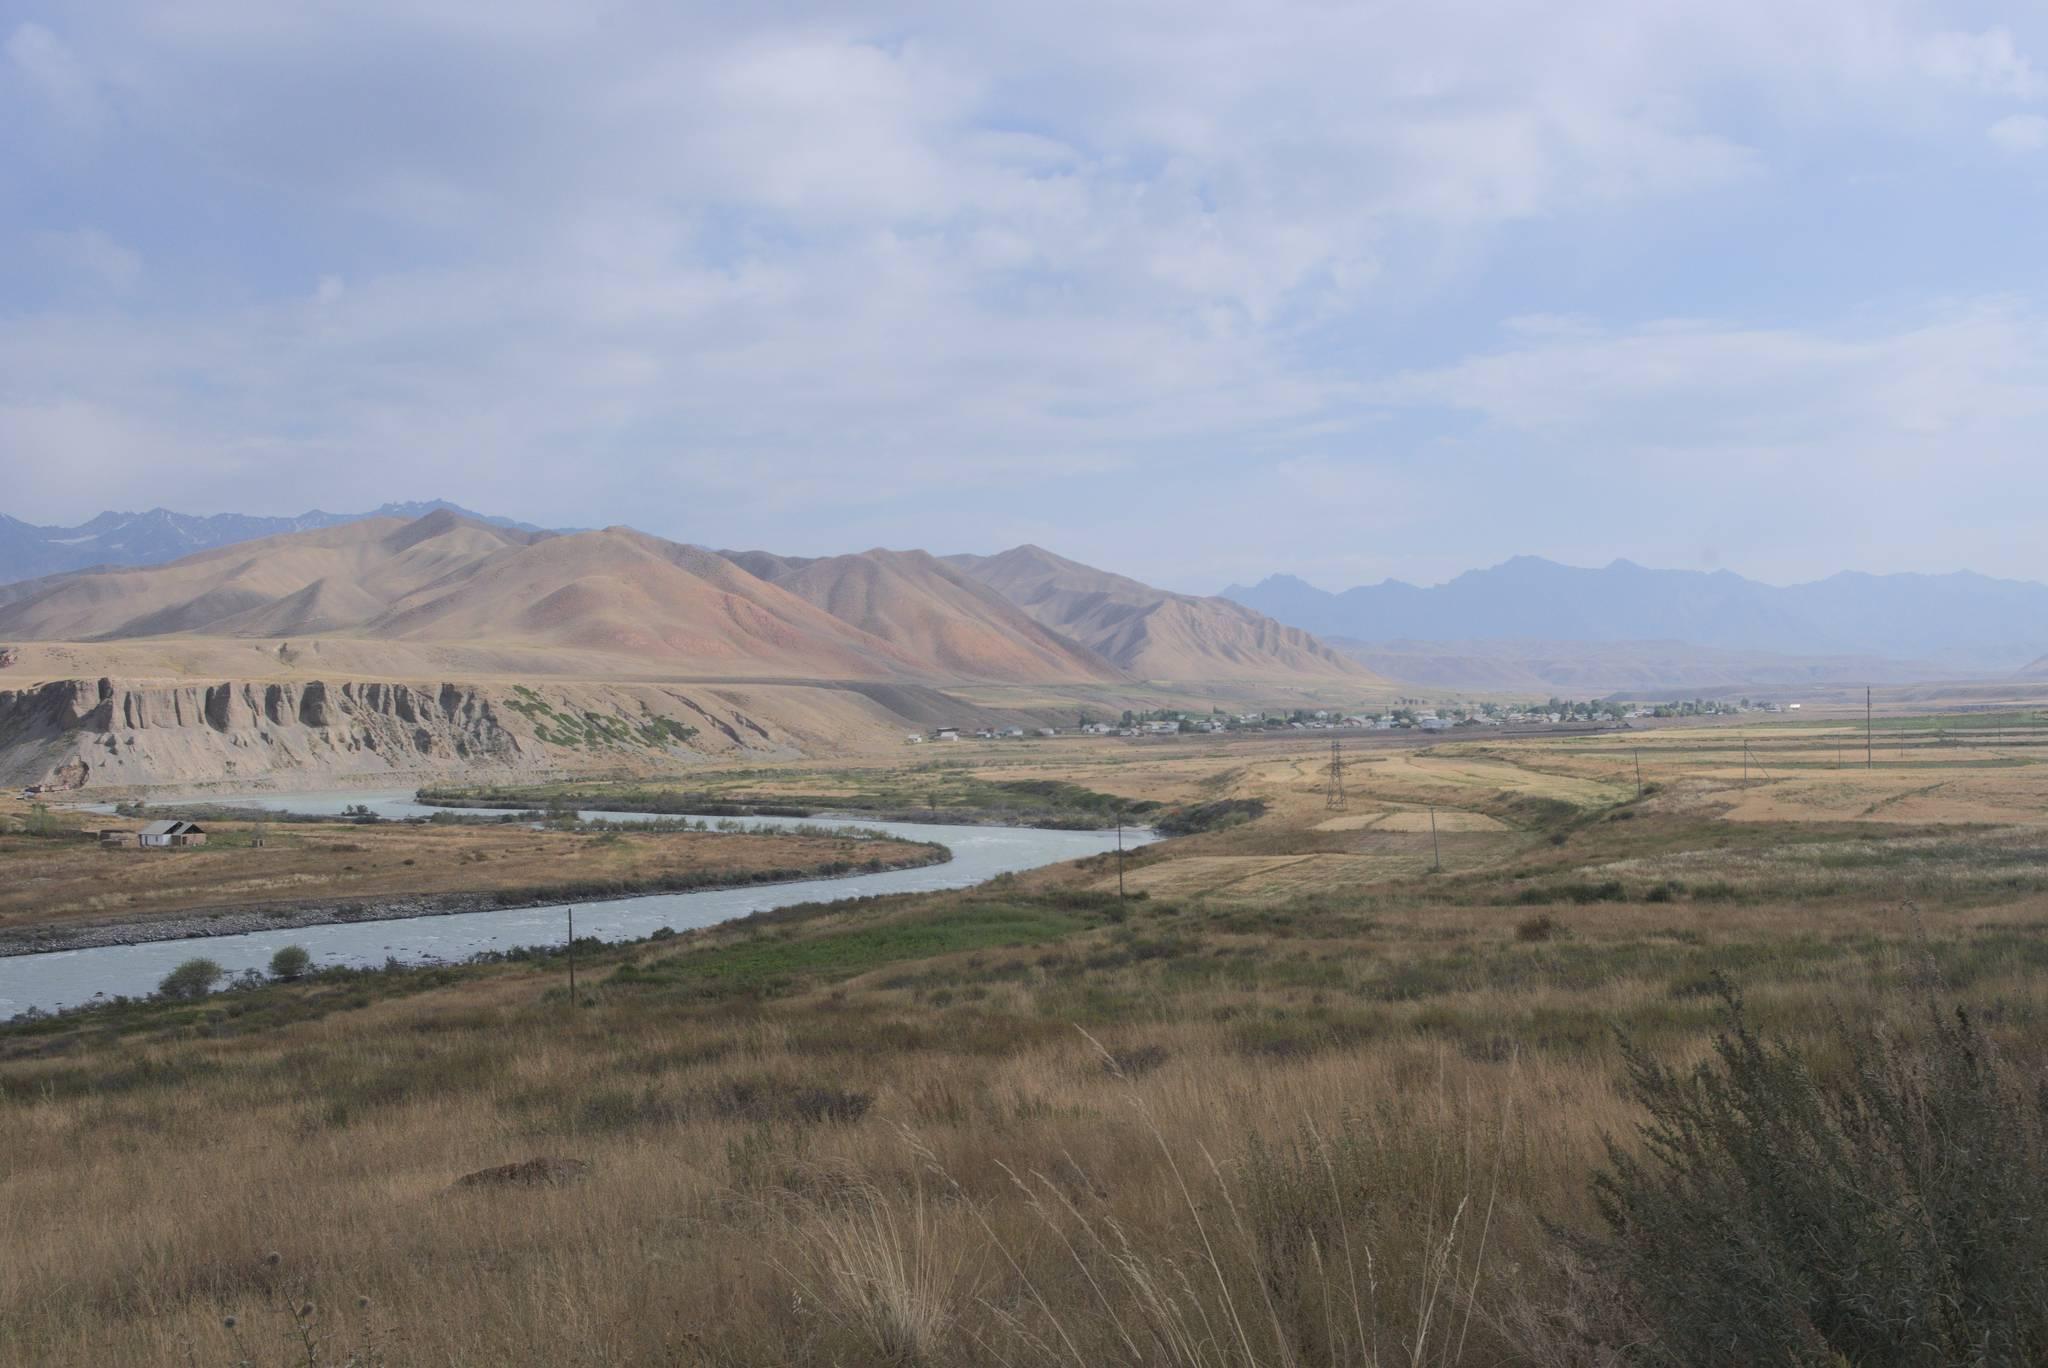 A za miastem dolina Narynu